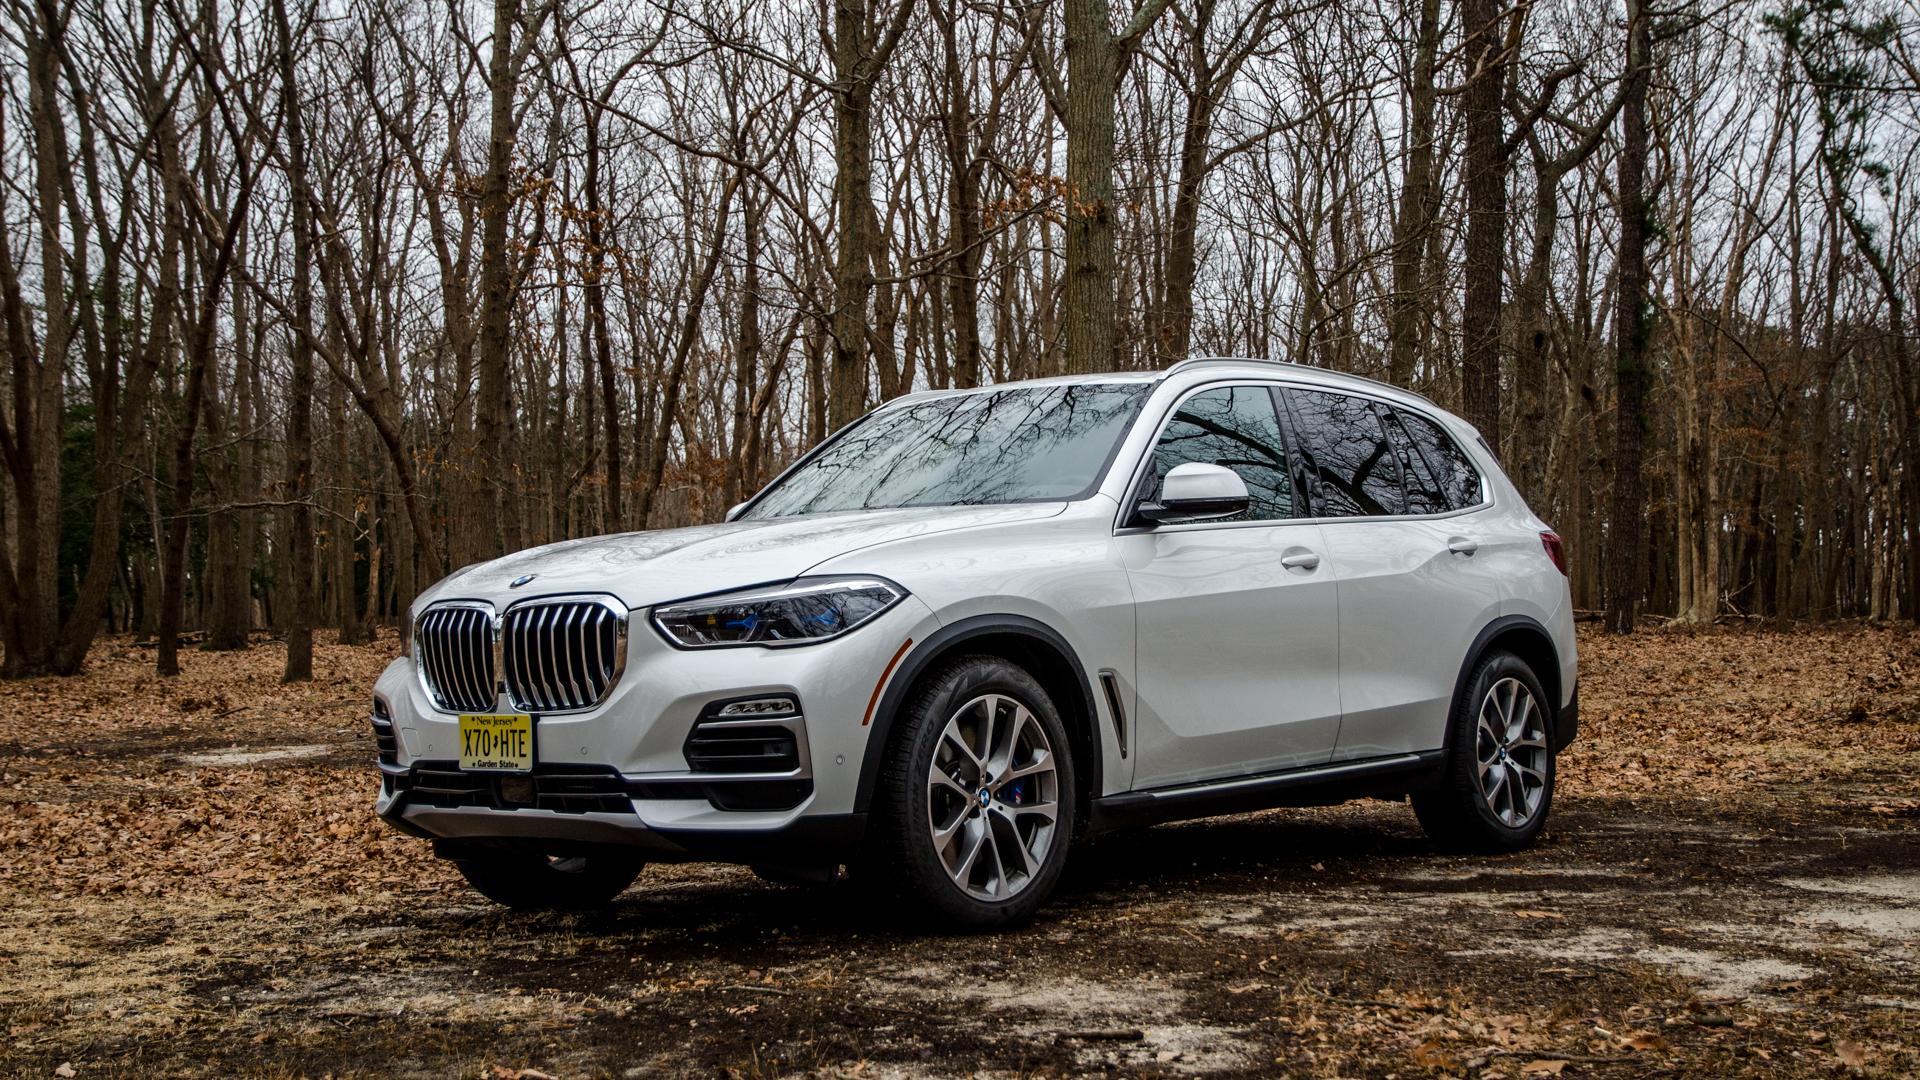 2019 BMW X5 xDrive40i 20 of 46